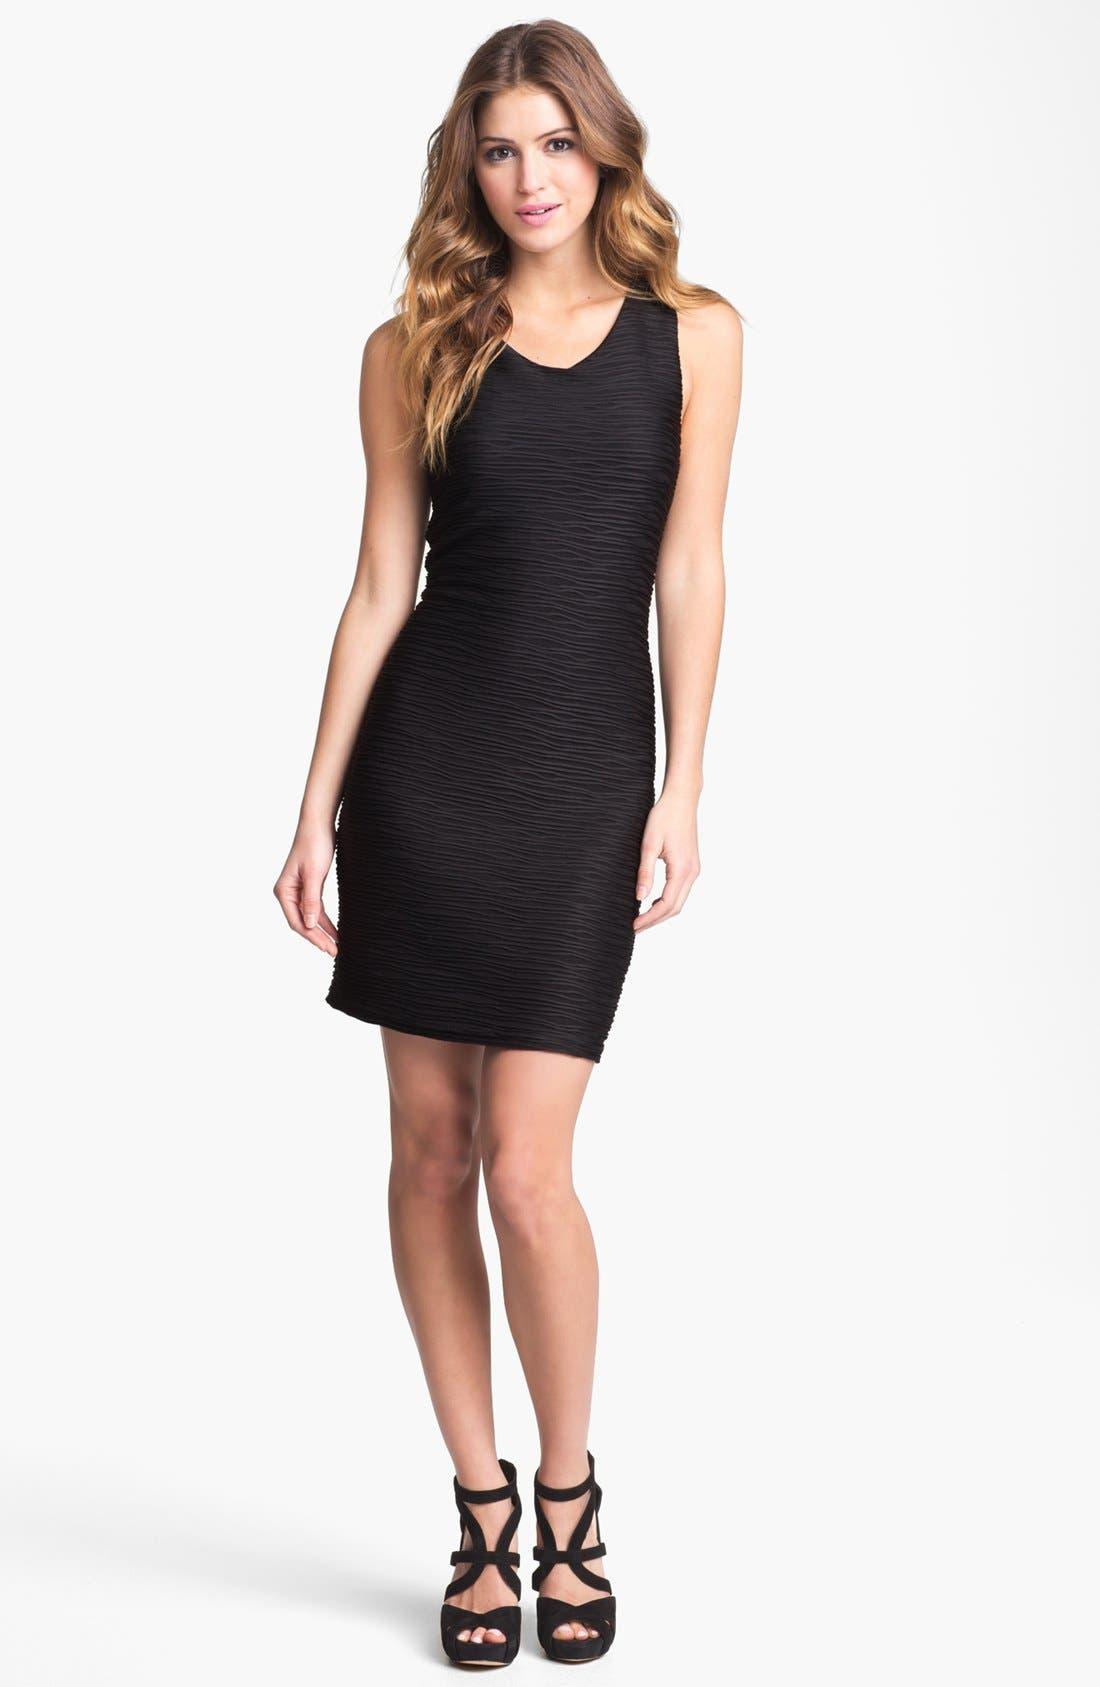 Main Image - Abi Ferrin 'Lindsey' Textured Racerback Dress